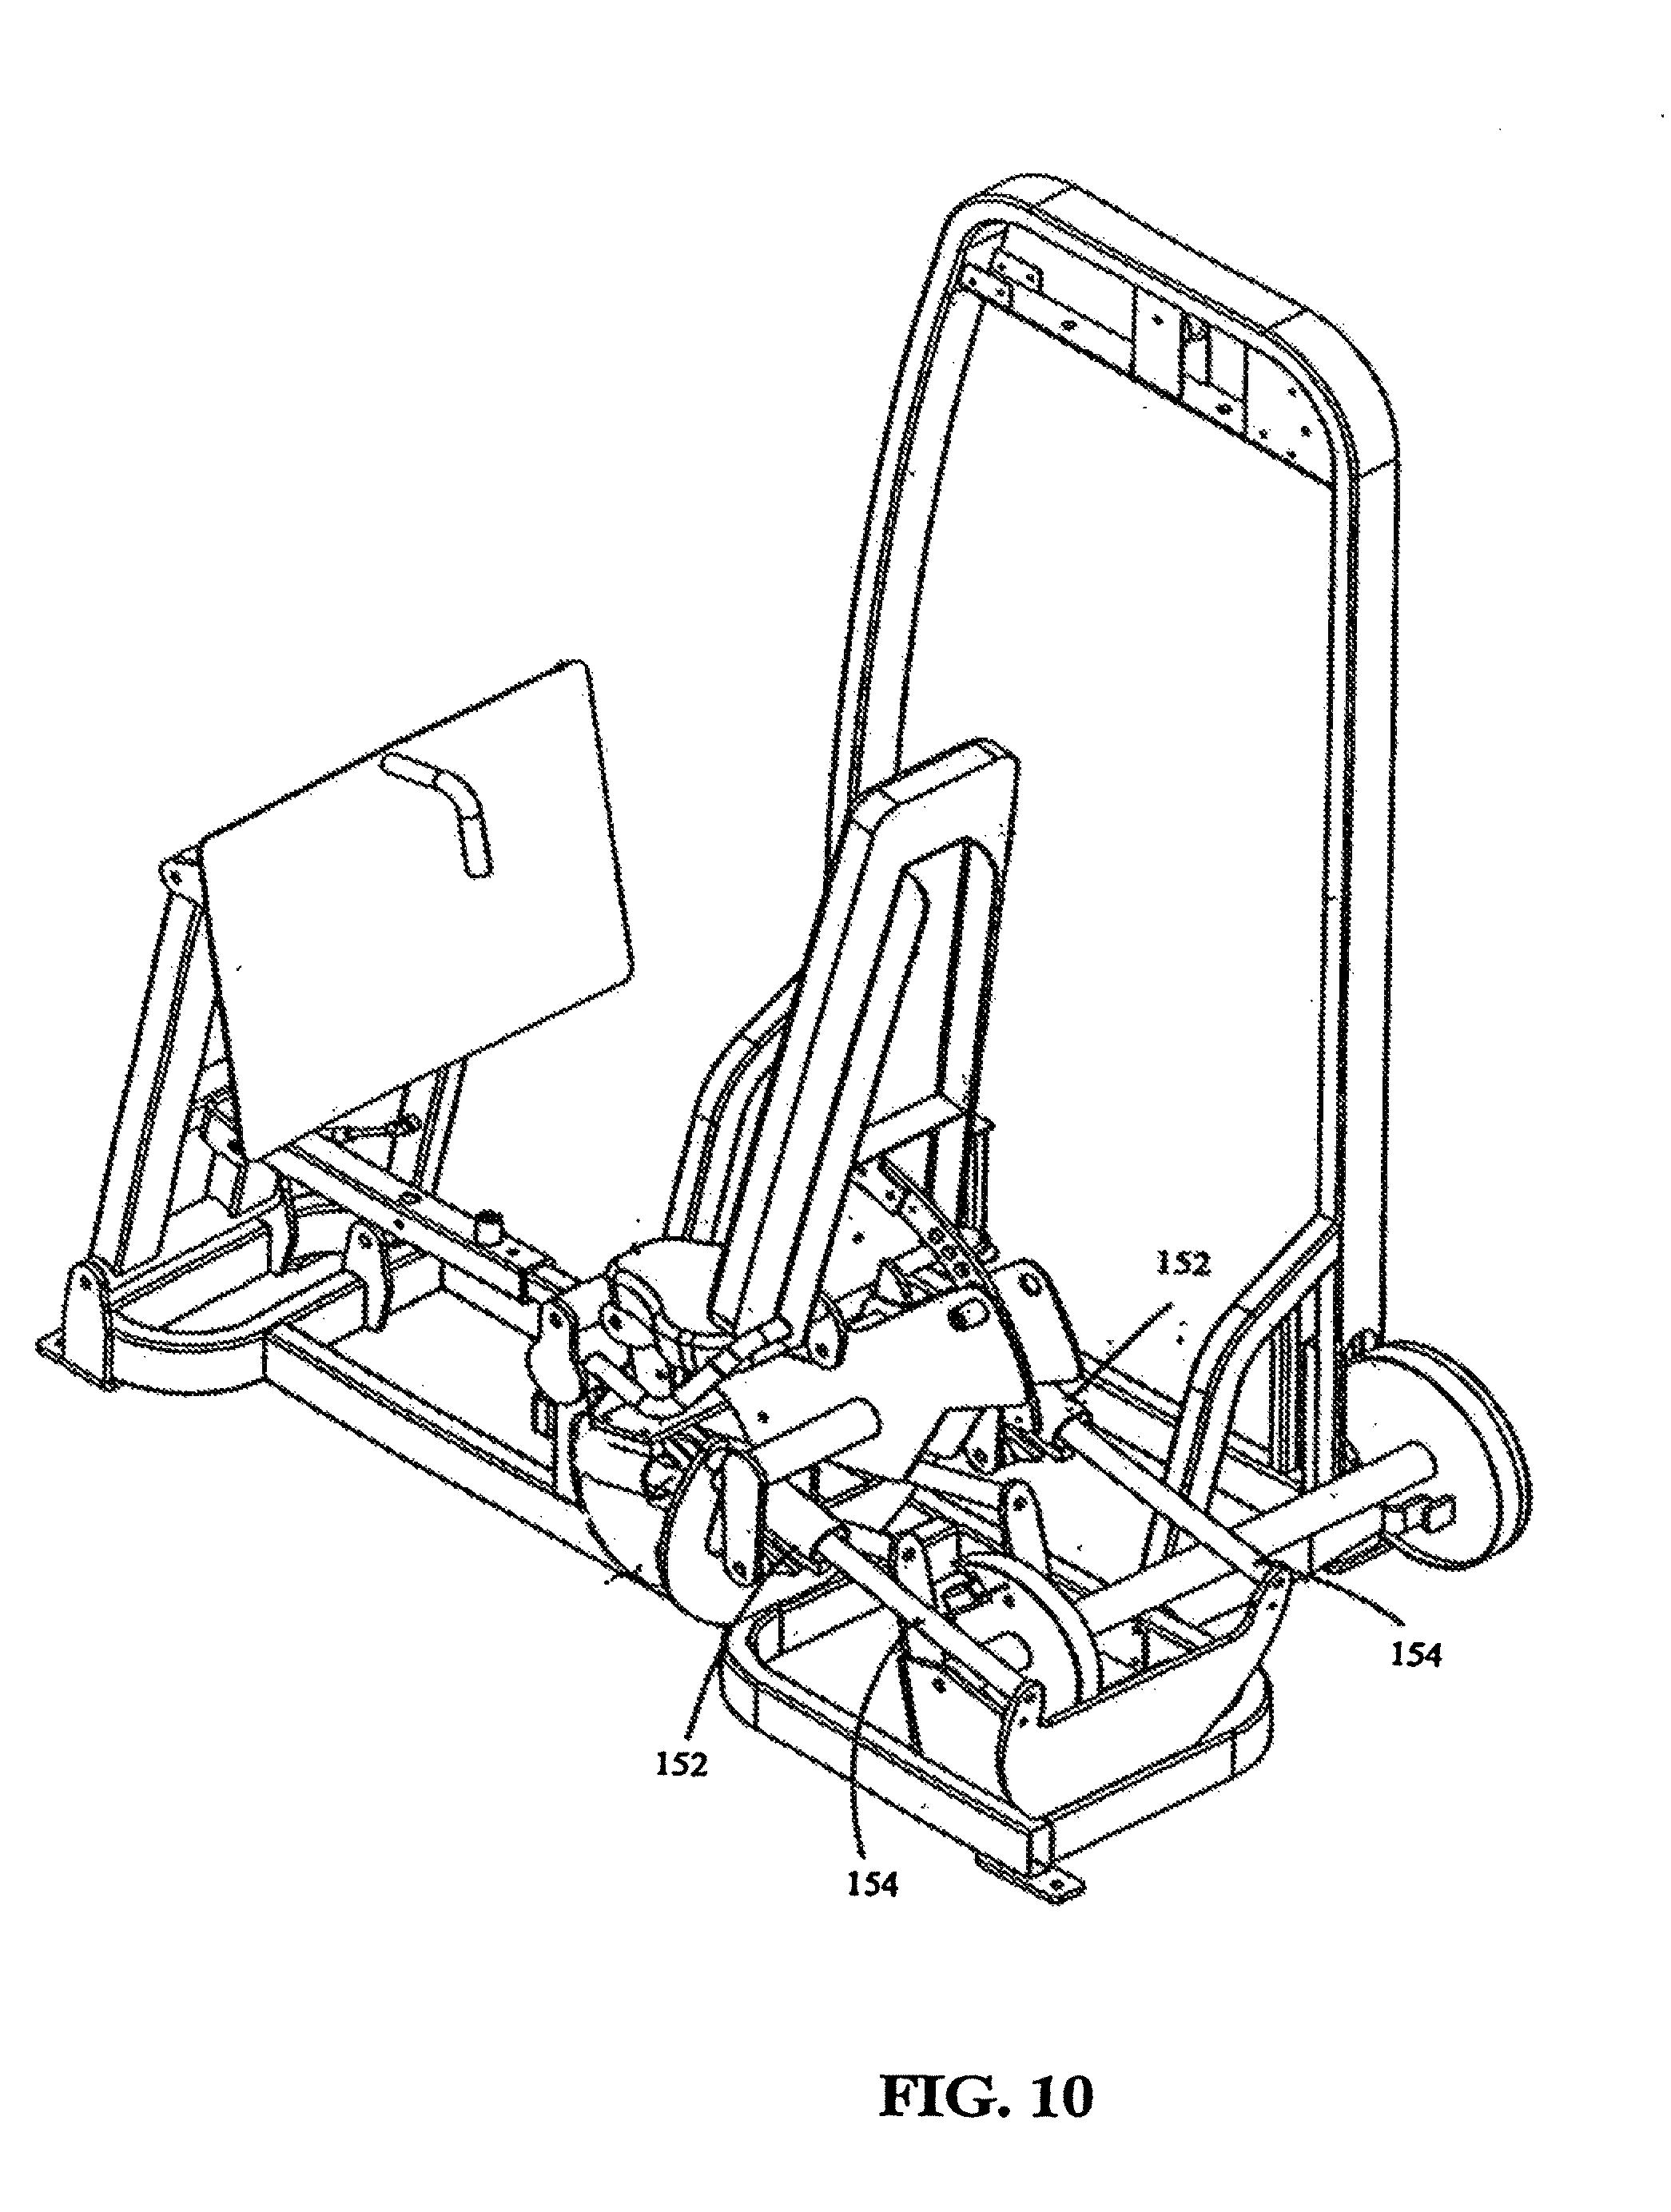 Patent US7727128 - Leg press machine - Google Patentsuche